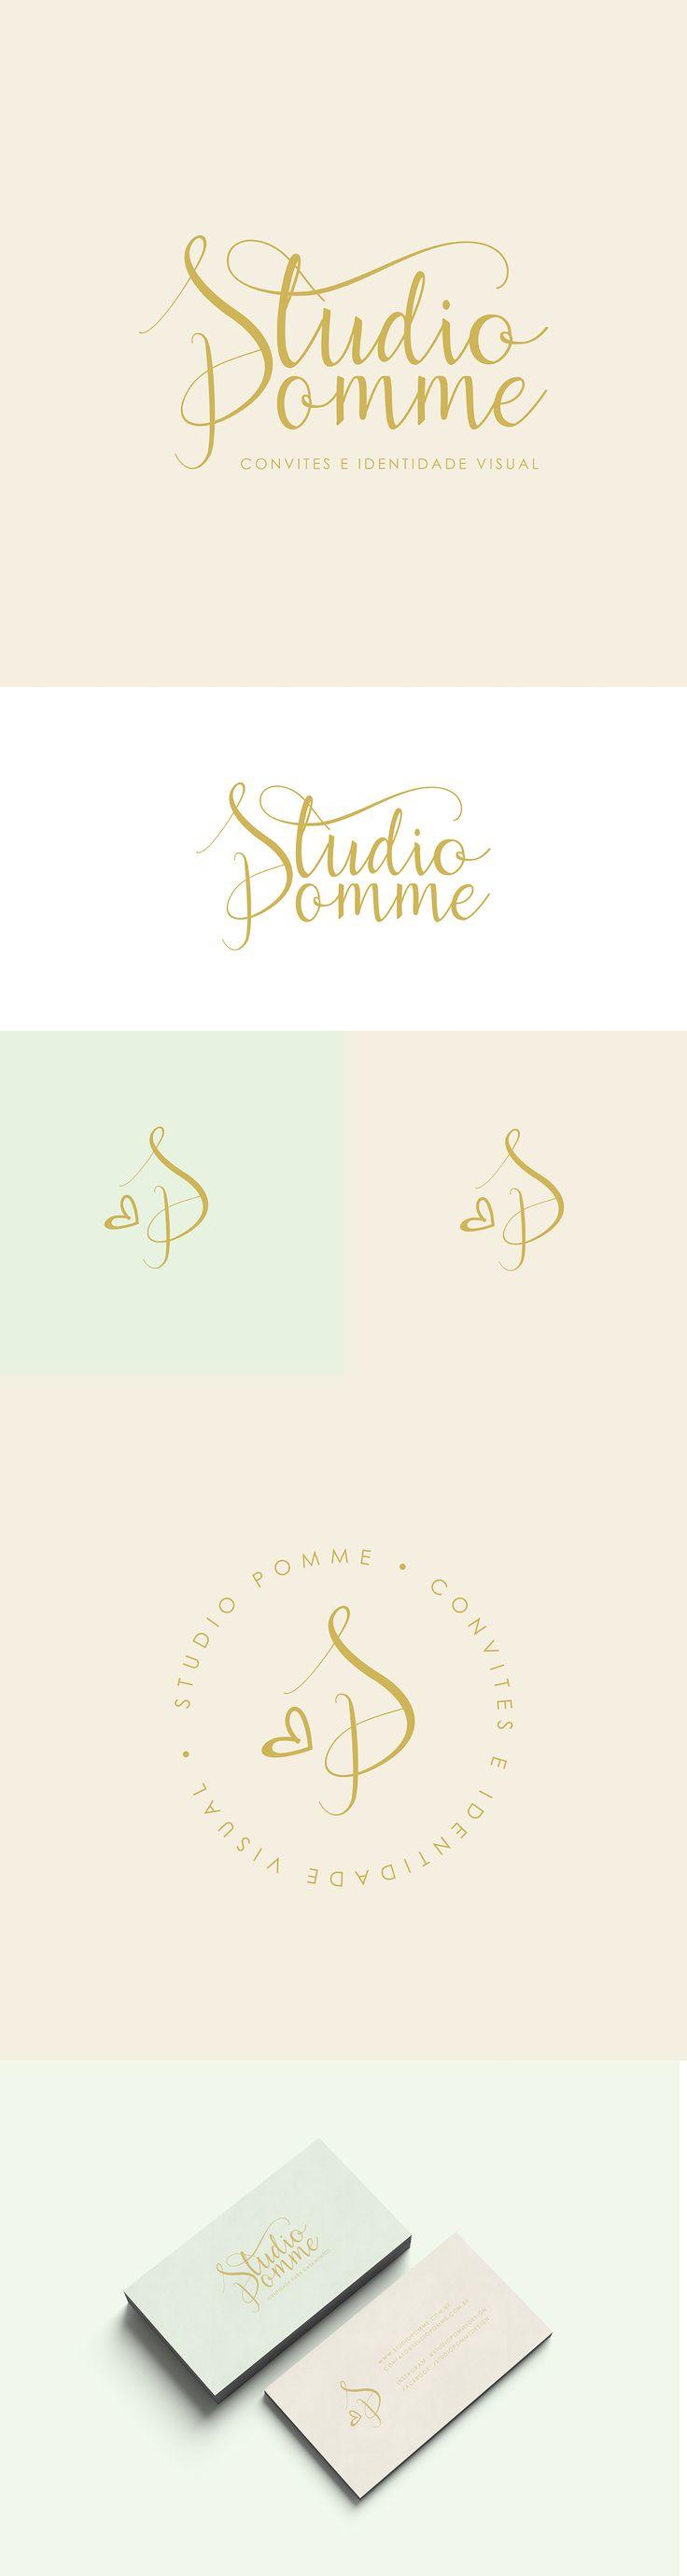 Studio Pomme – Estudio Vanilla